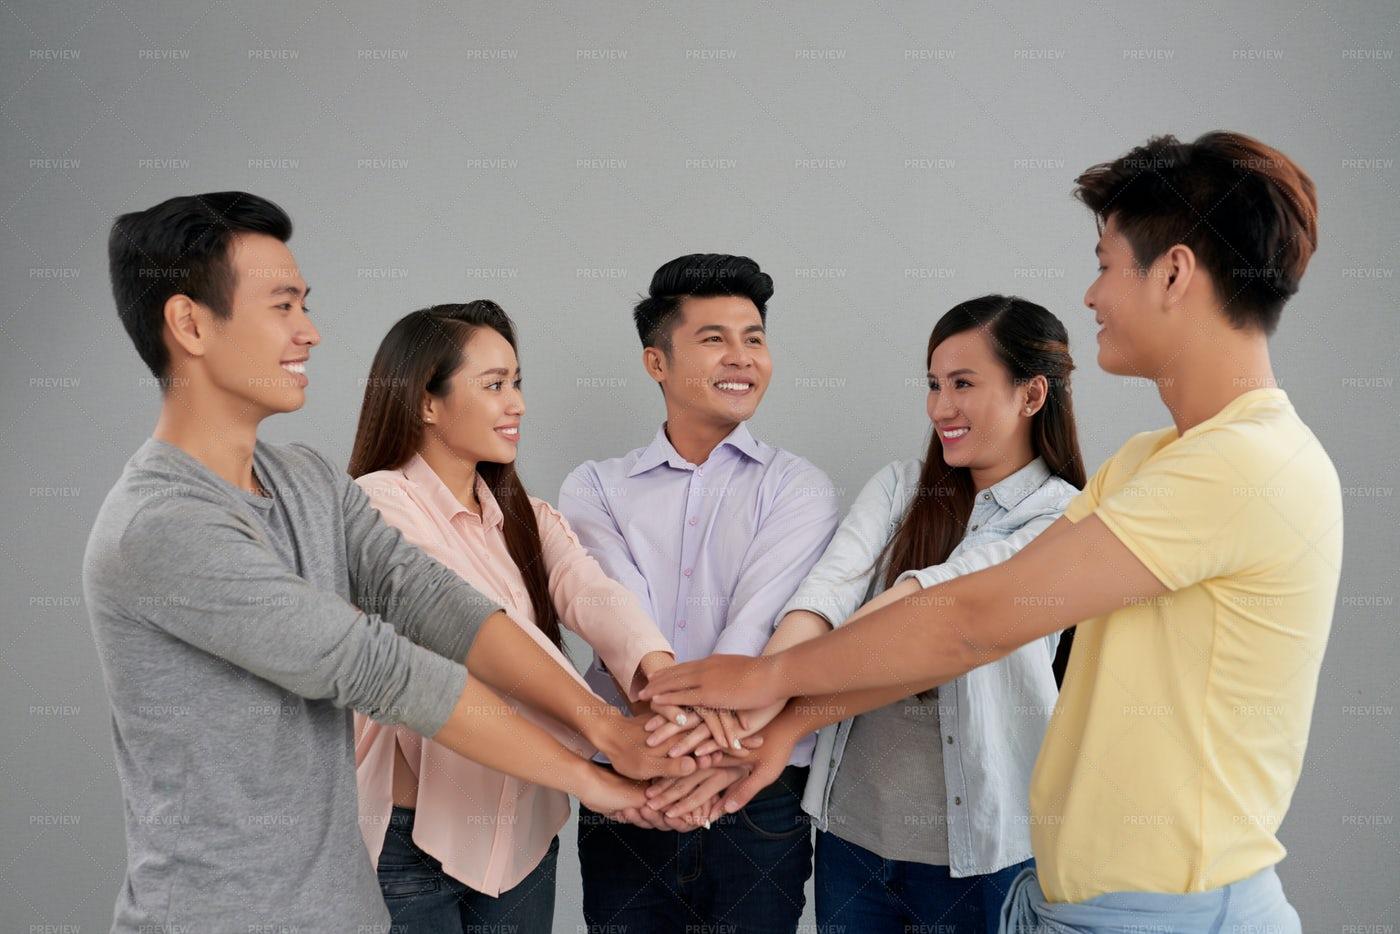 Friendship: Stock Photos